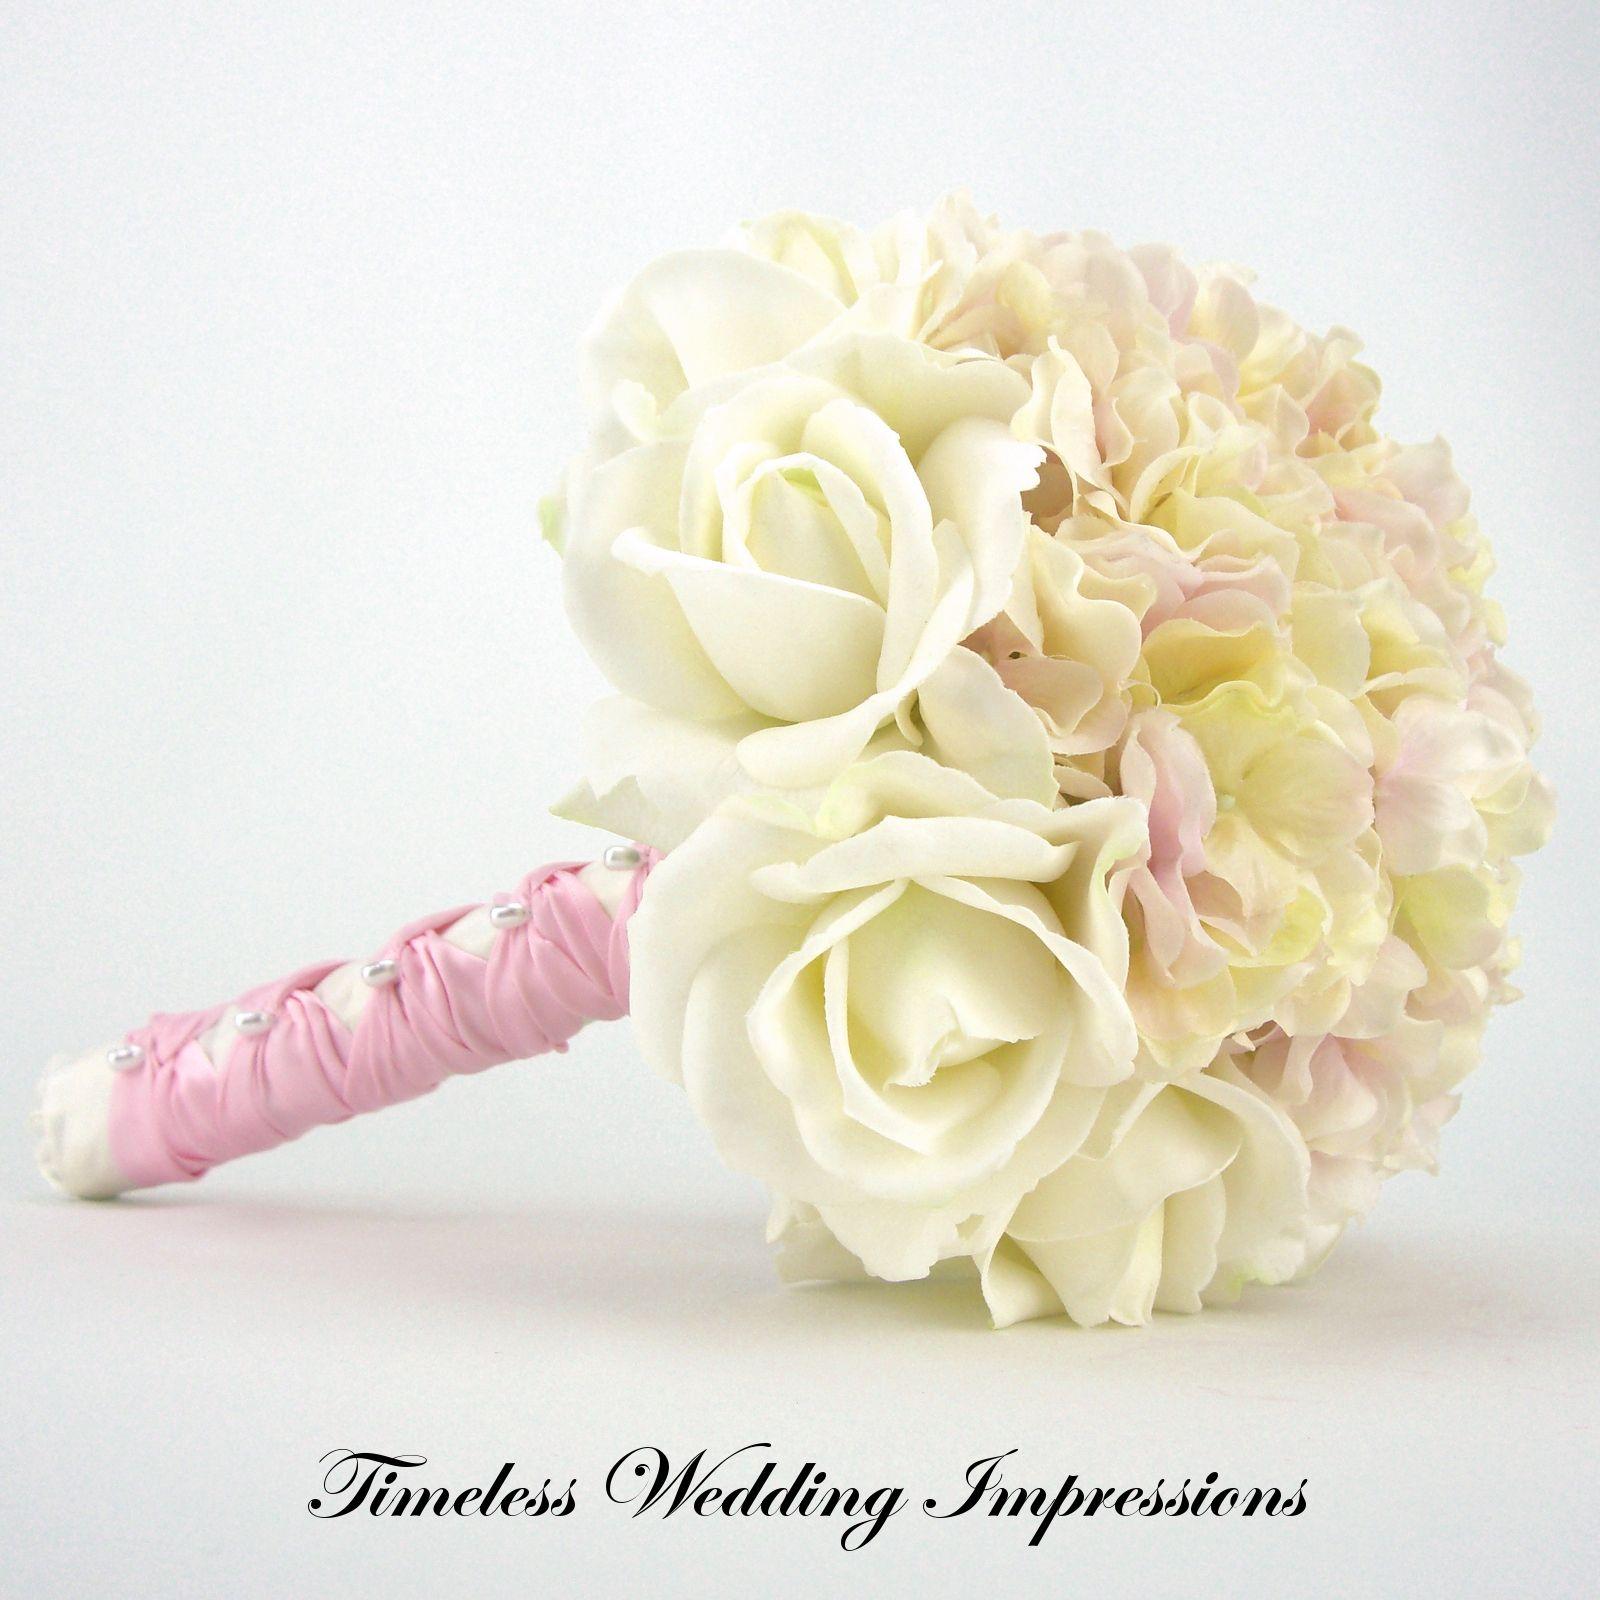 Hydrangea Wedding Bouquets Bridal Bouquet Real Touch Pink White Silk Wedding Flowers Biede Silk Flowers Wedding Bridal Bouquet Pink White Rose Bridal Bouquet